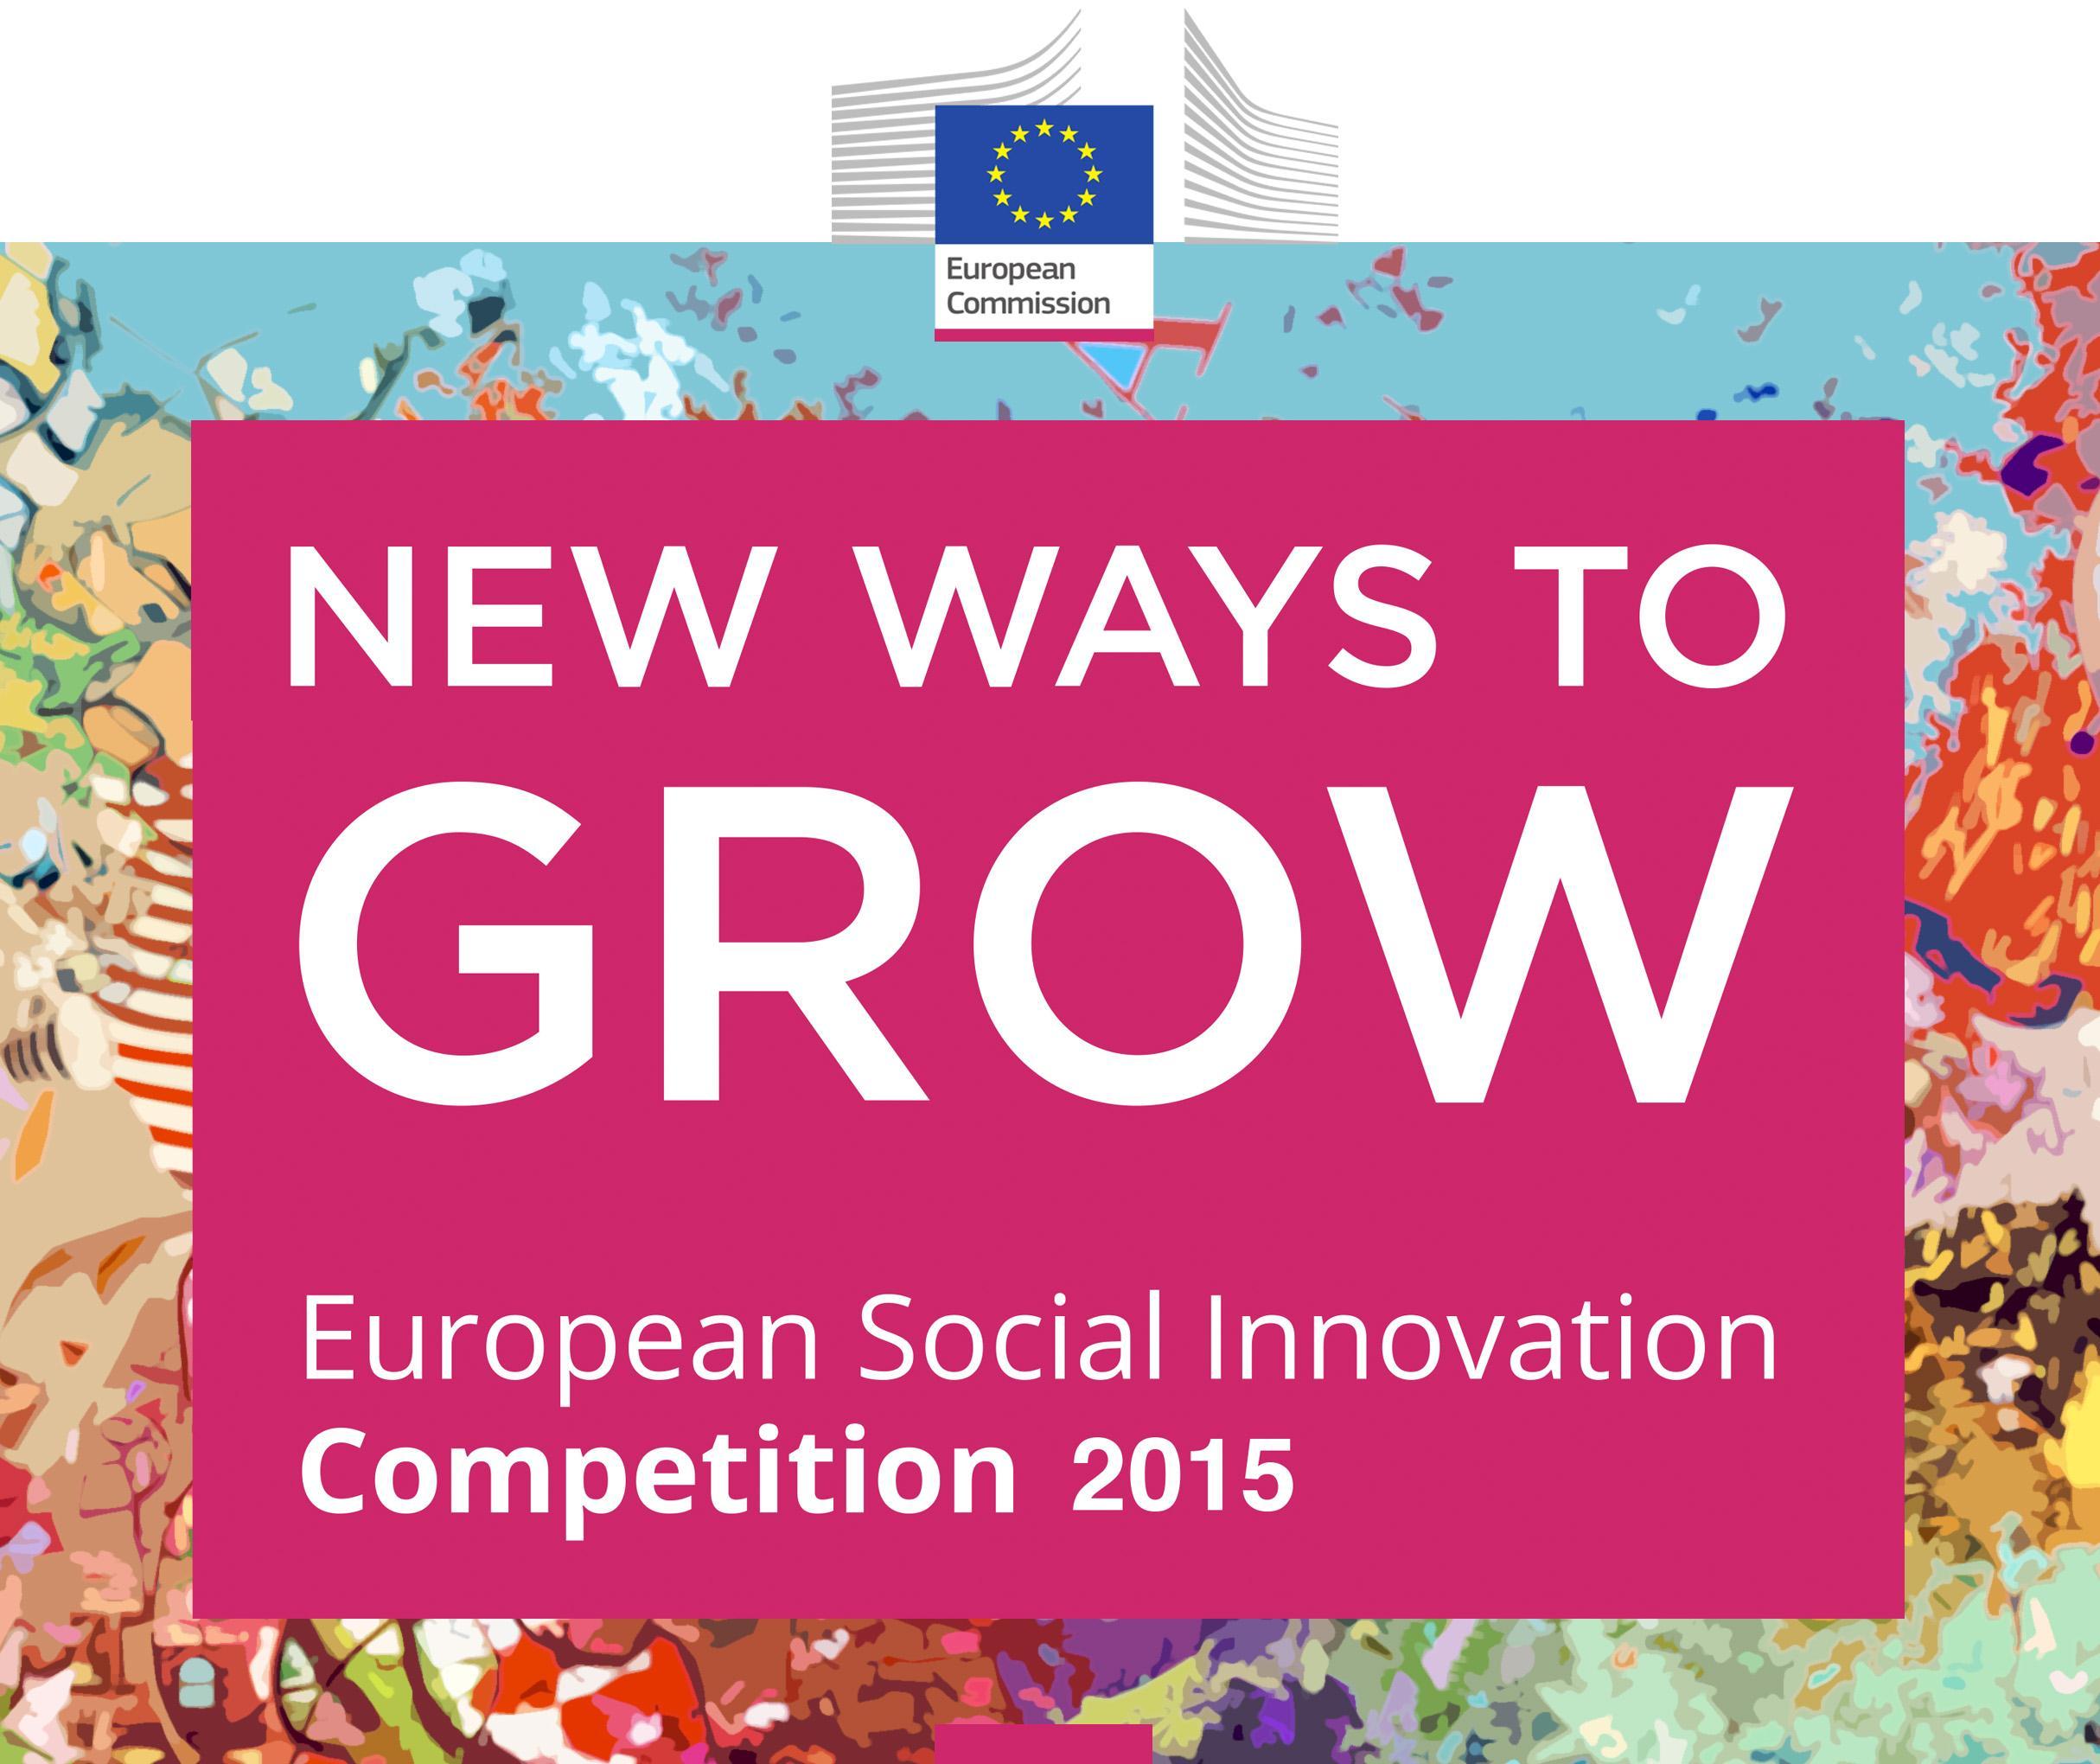 avrupa birliği sosyal inovasyon